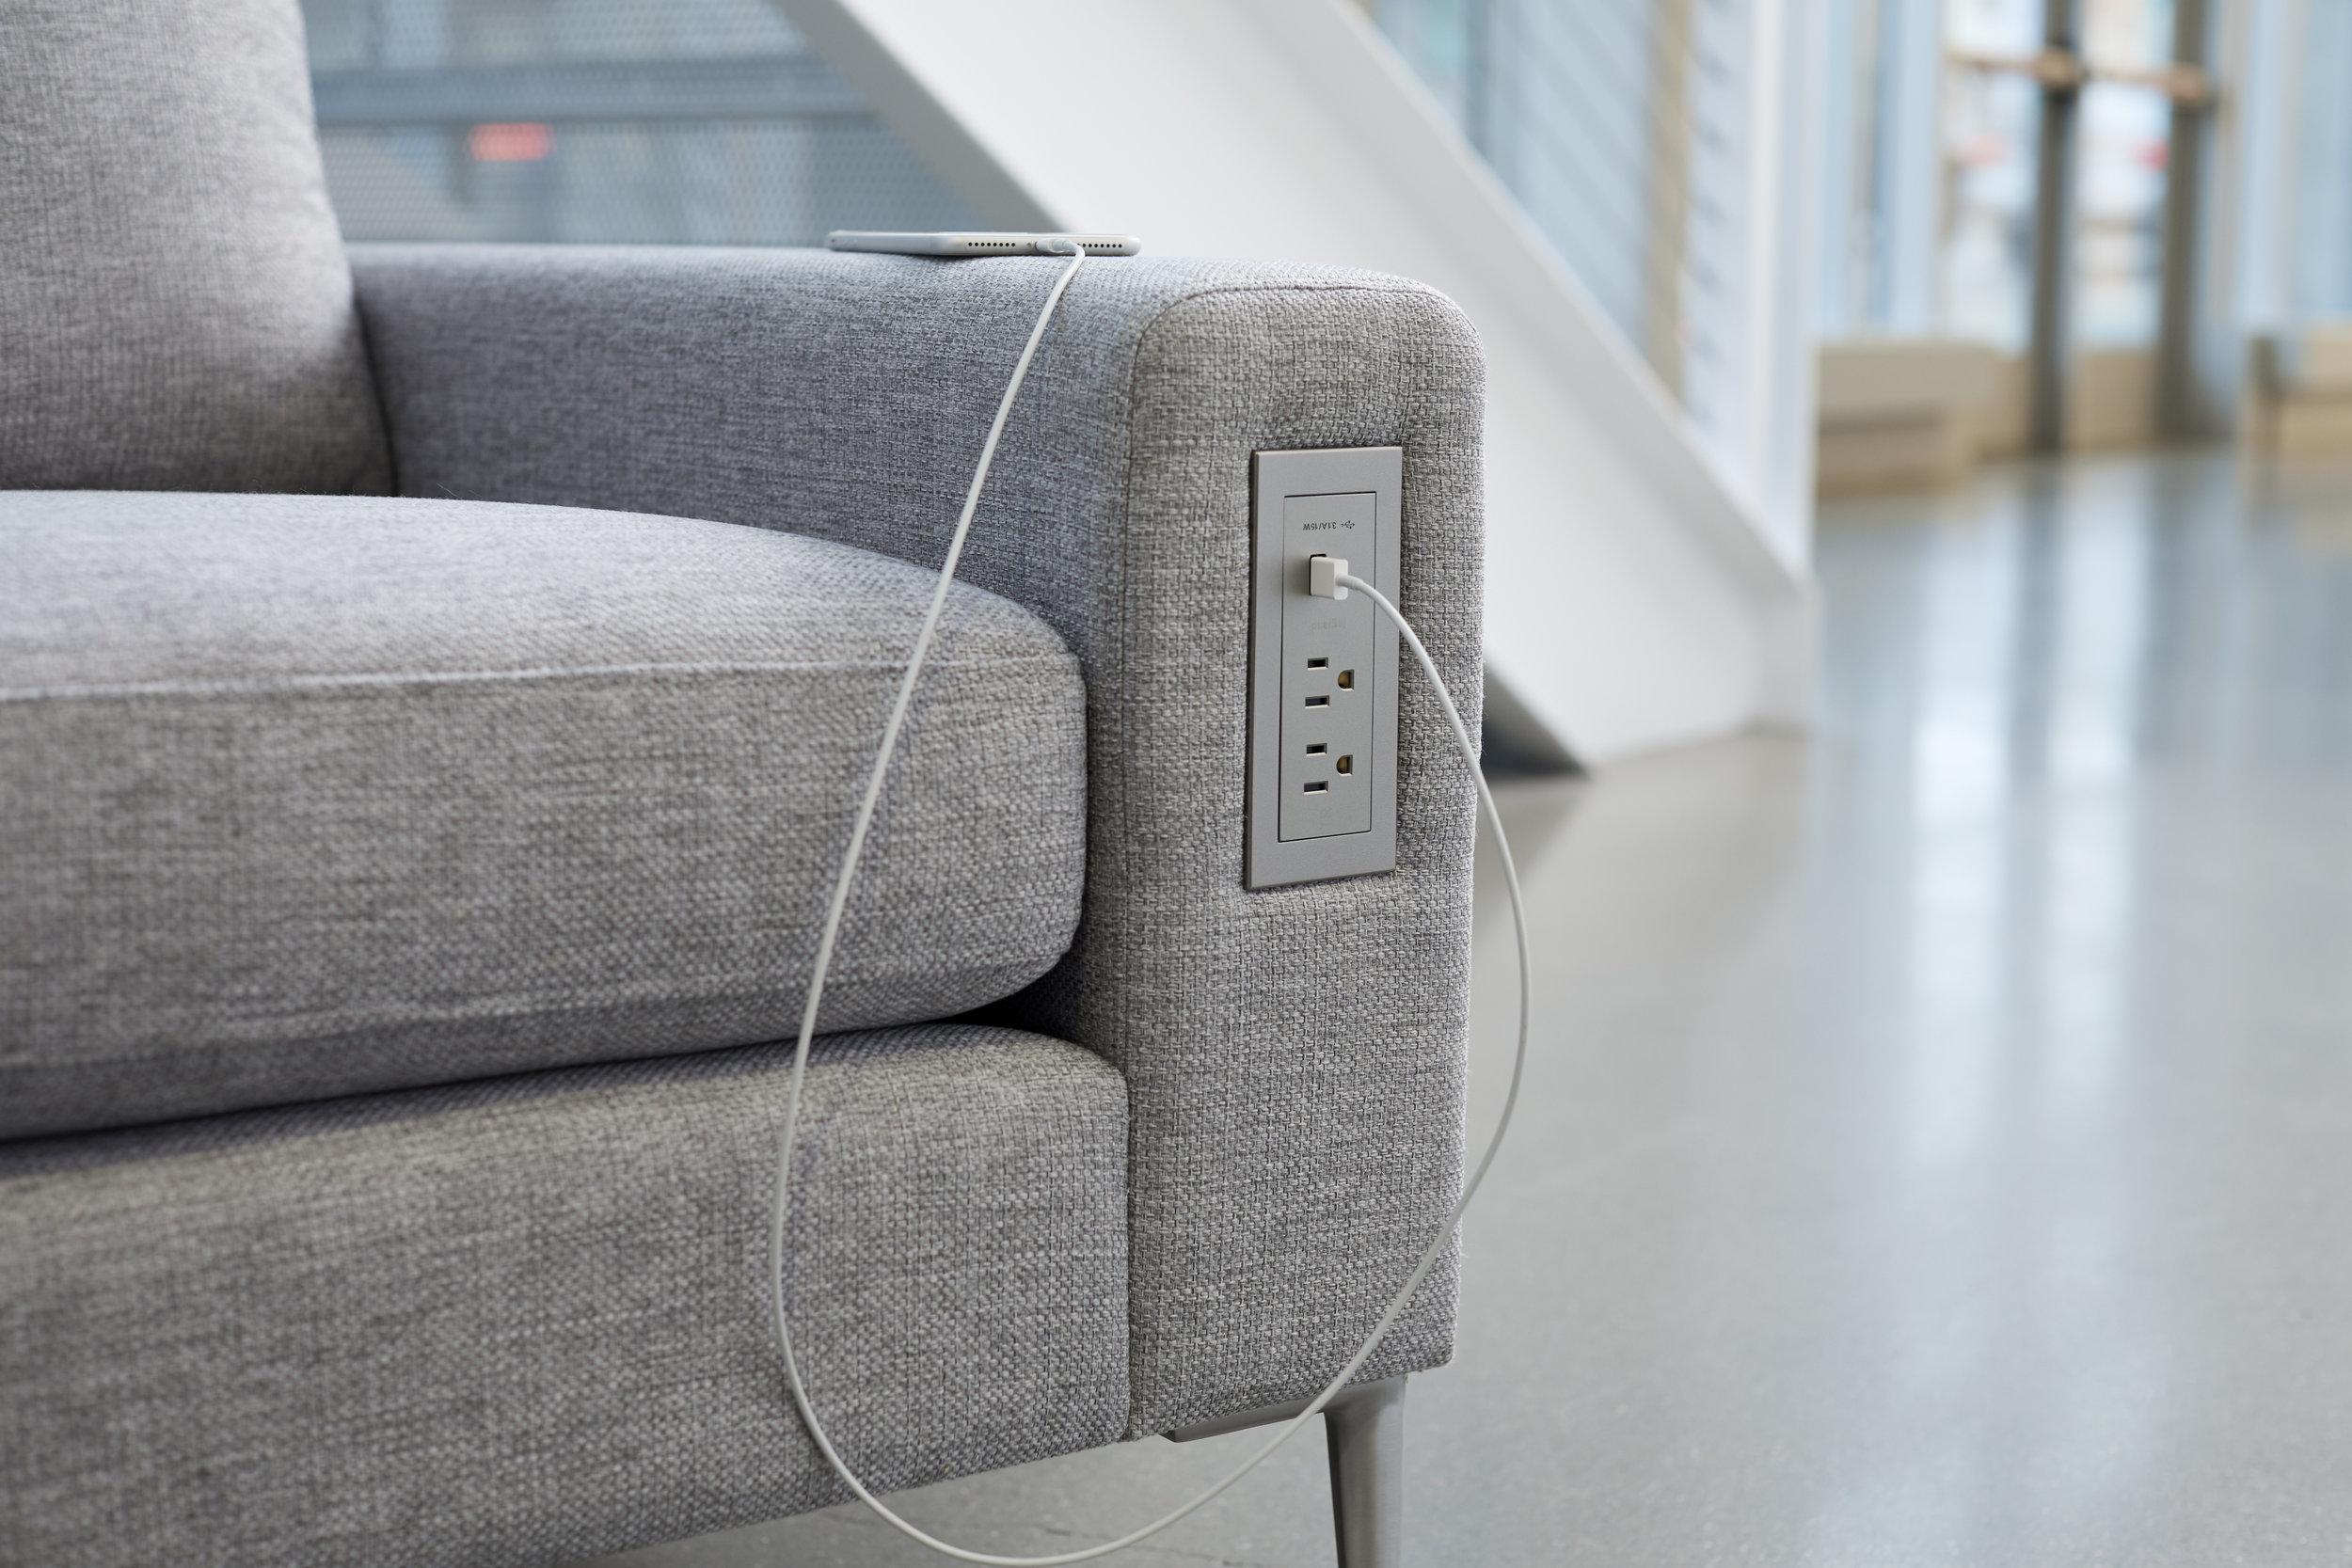 Legrand radiant Furniture Power Center_USBC.jpg